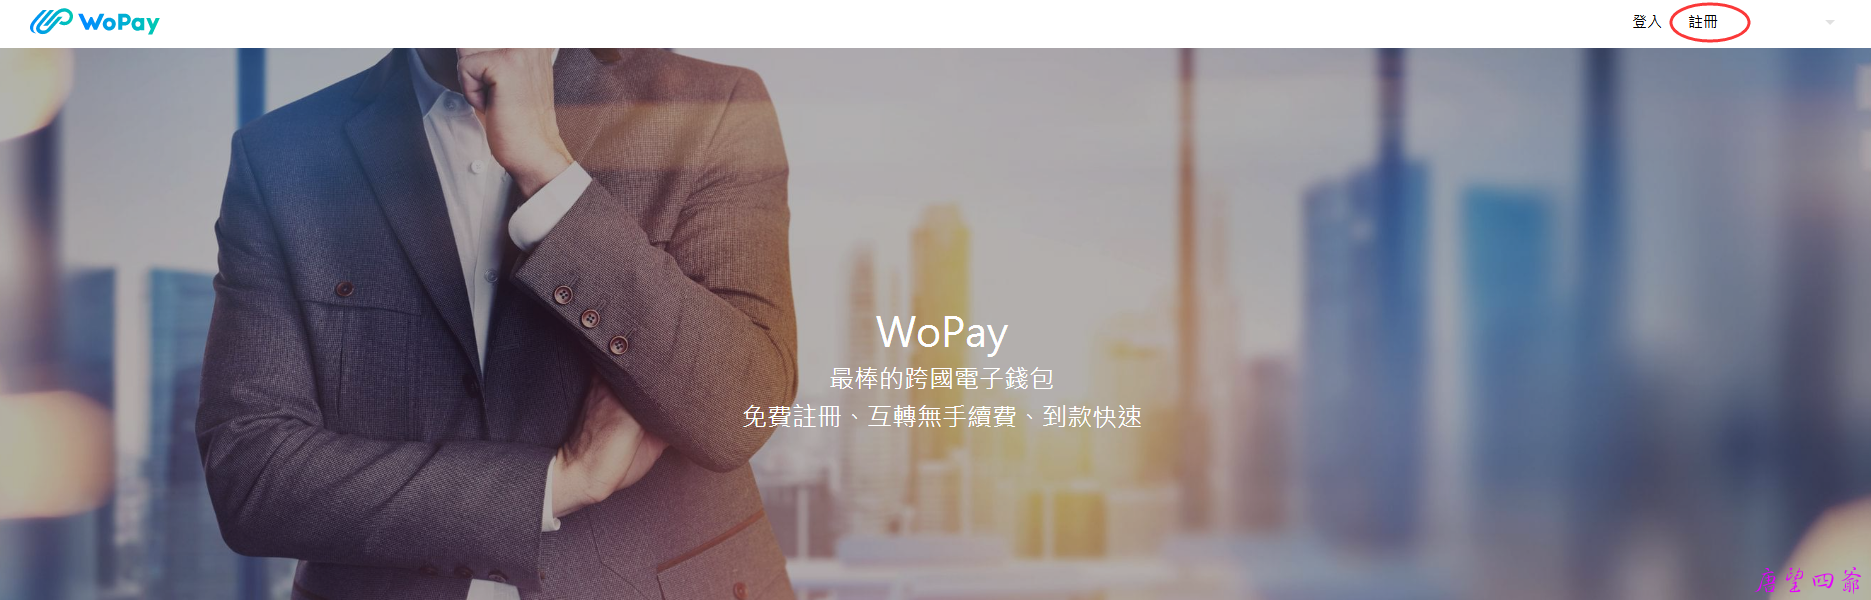 SPG超级金矿WoPay錢包註冊流程图文教程